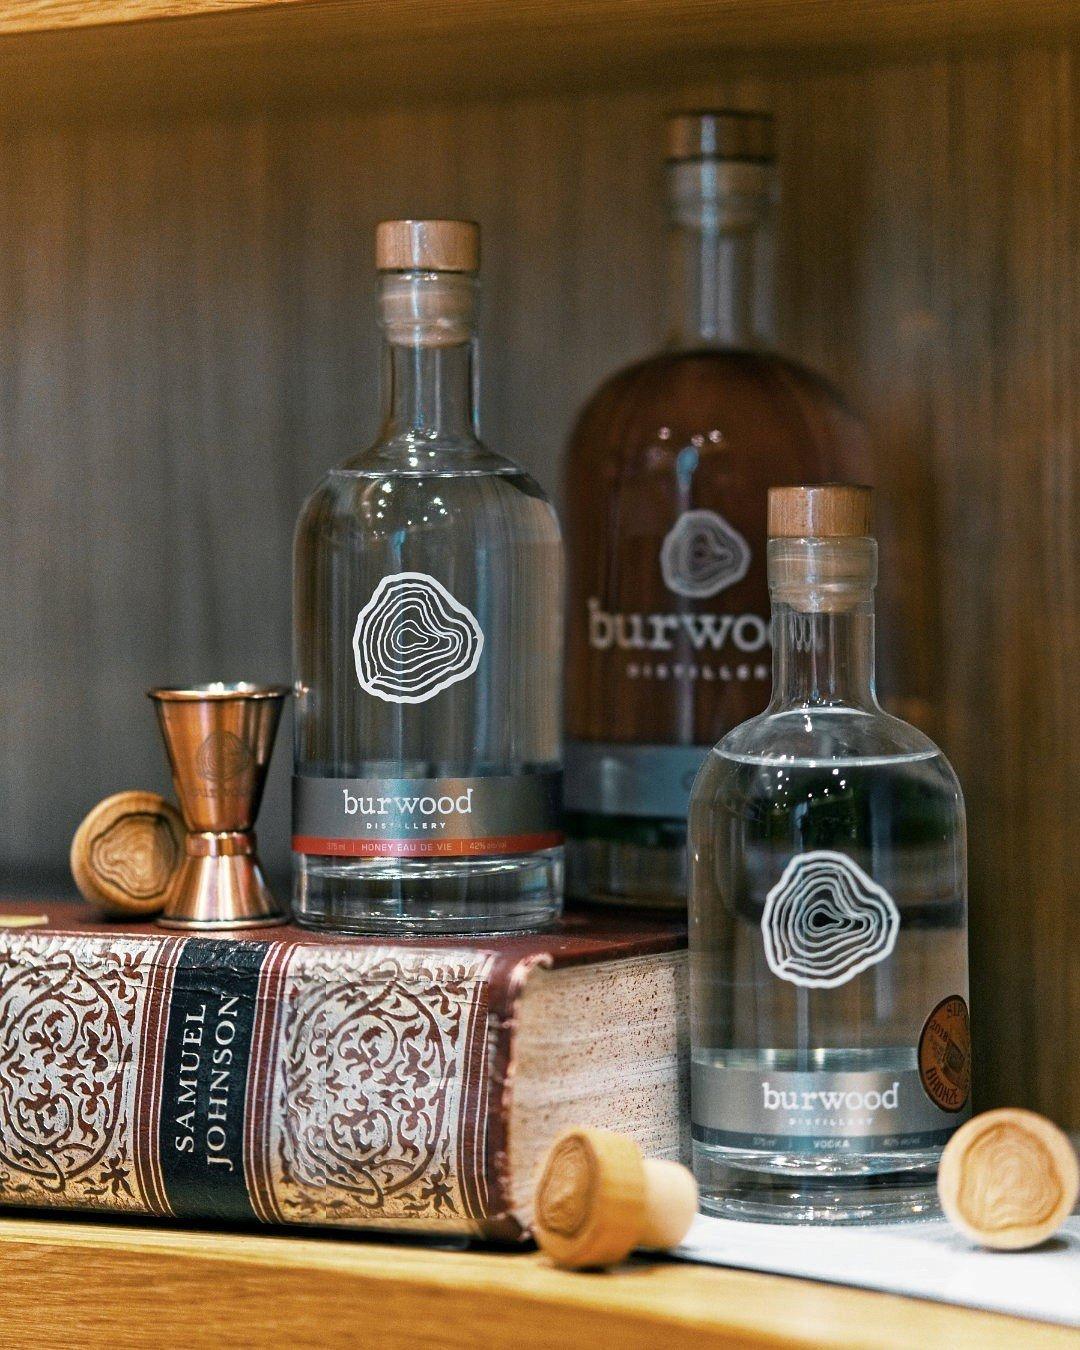 Burwood Honey Eau de Vie